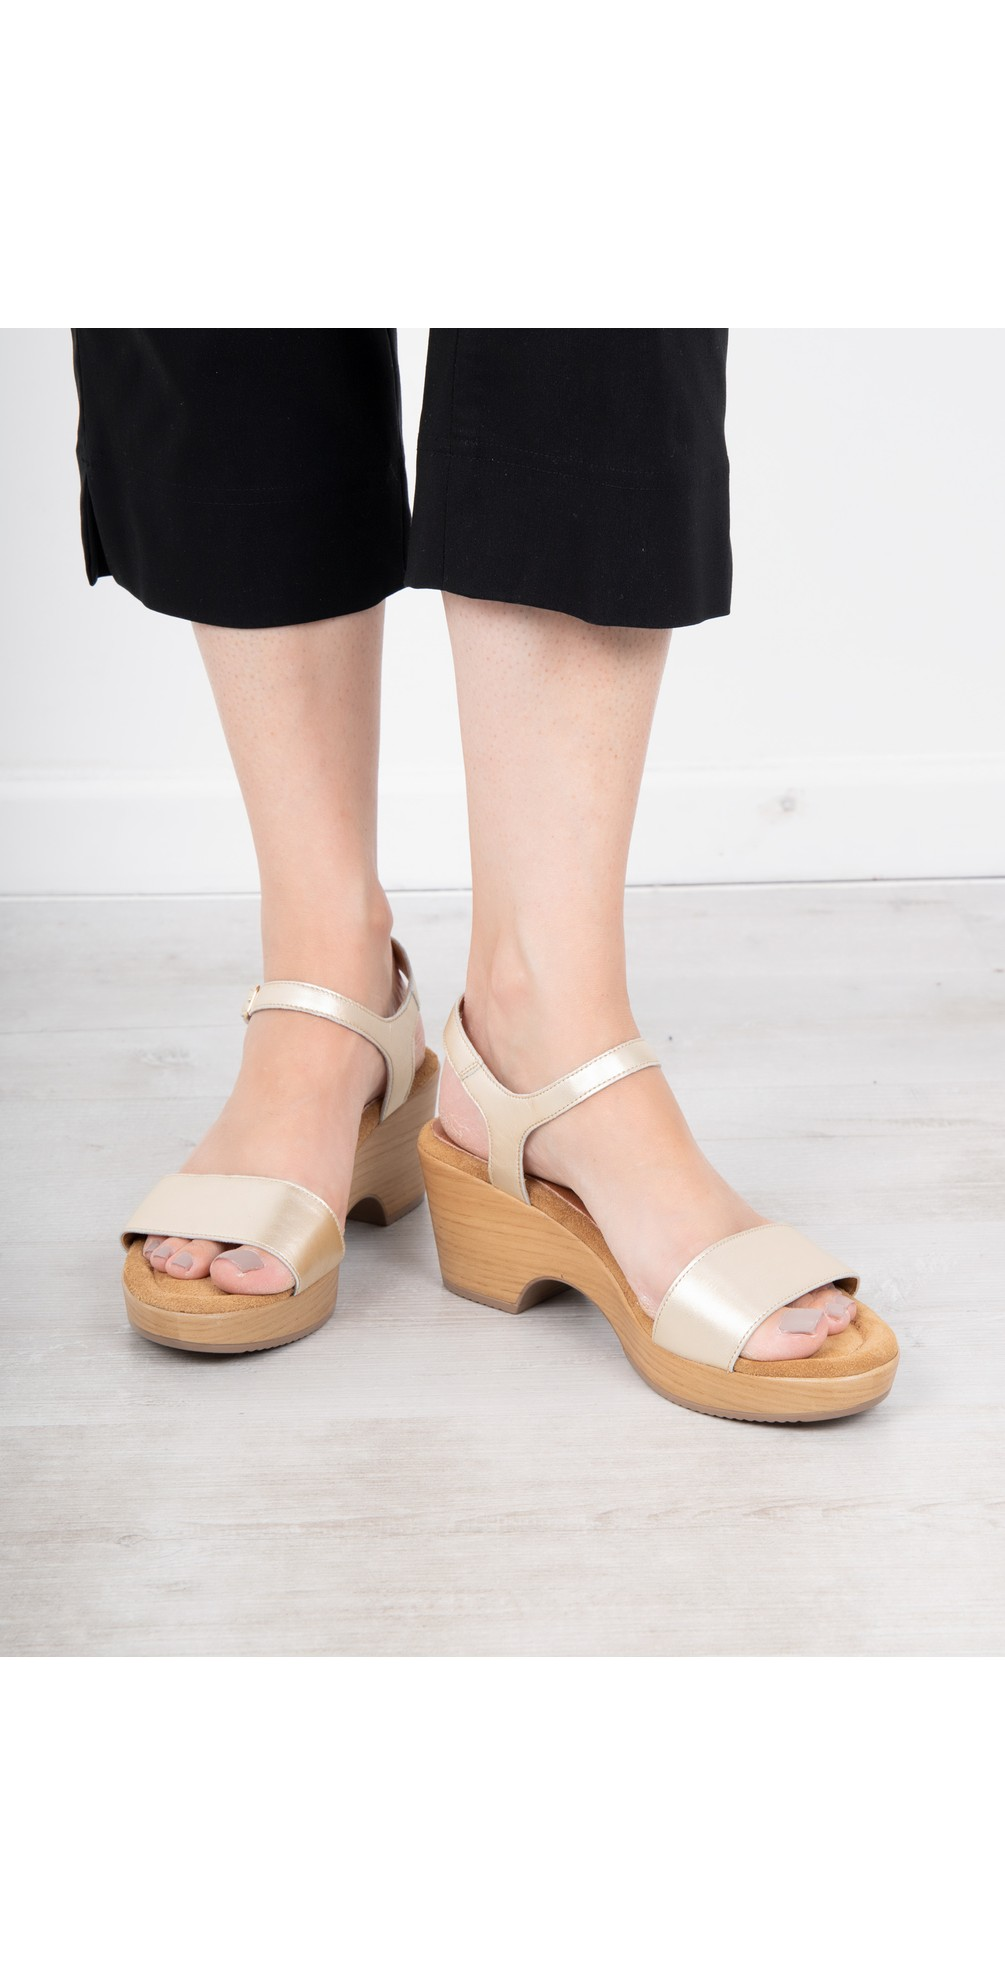 Aneka Icon Platine Metallic Leather Wedge Sandal main image